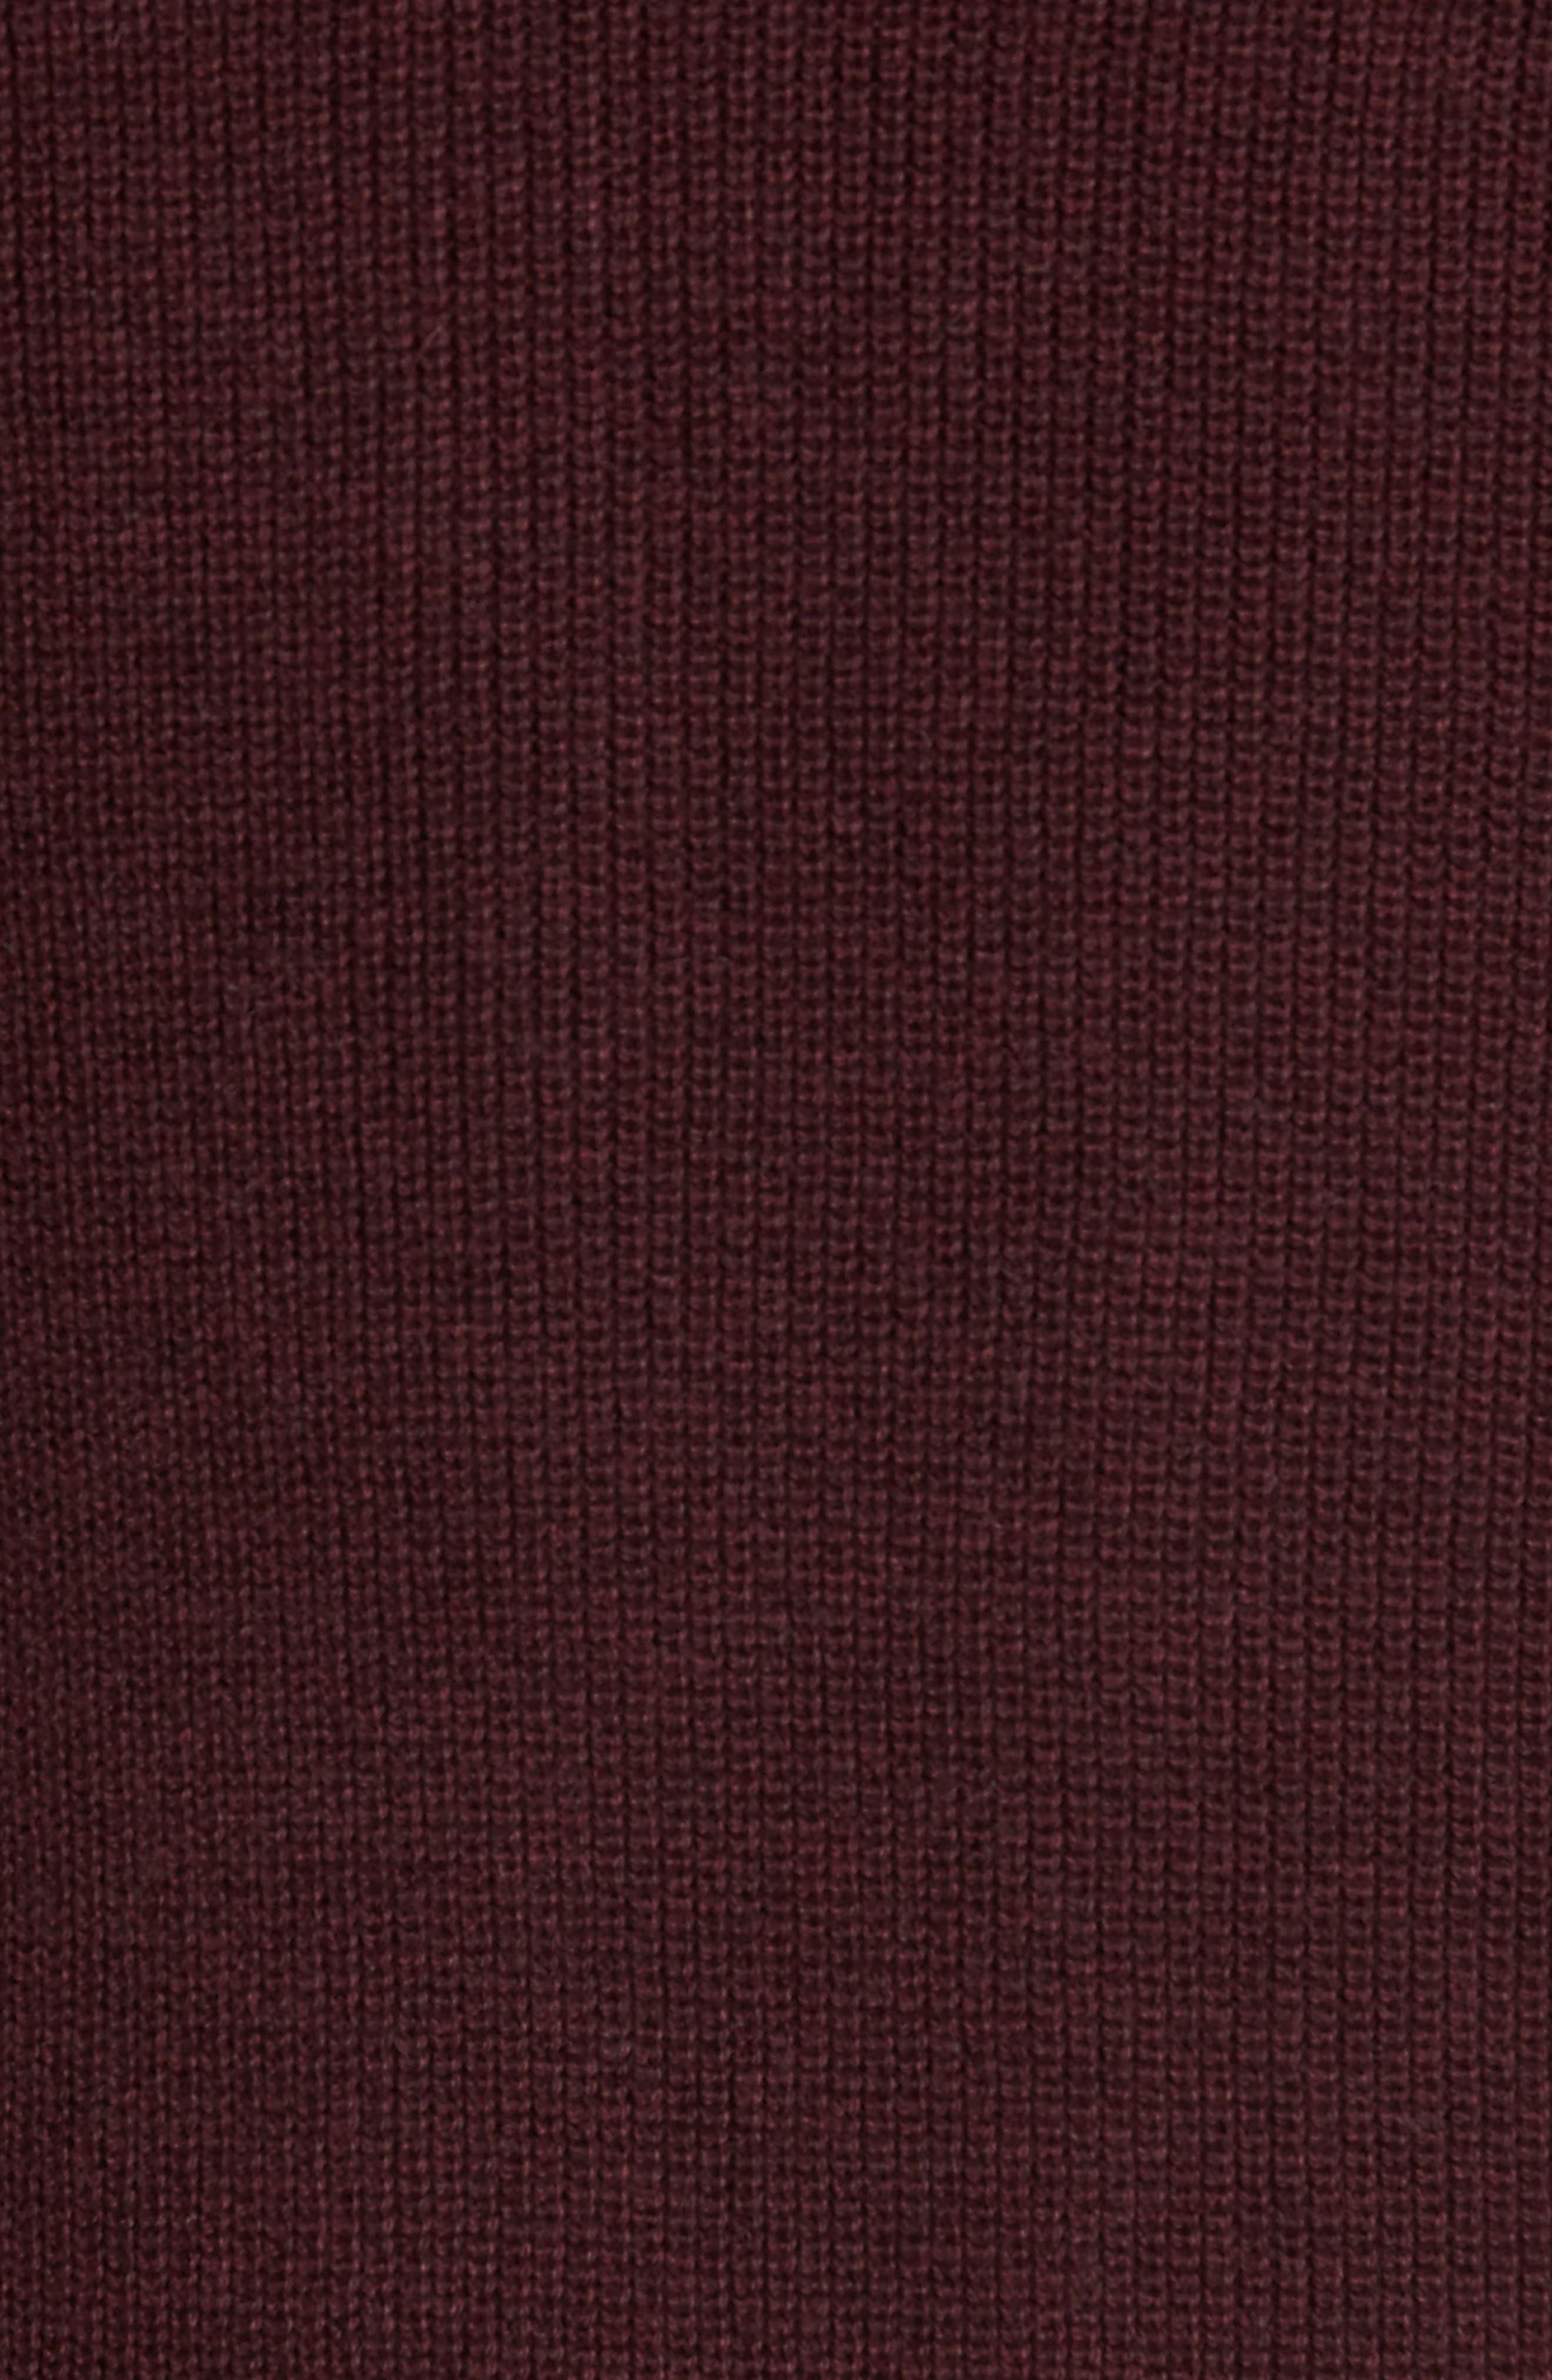 Cotton & Cashmere Henley Sweater,                             Alternate thumbnail 15, color,